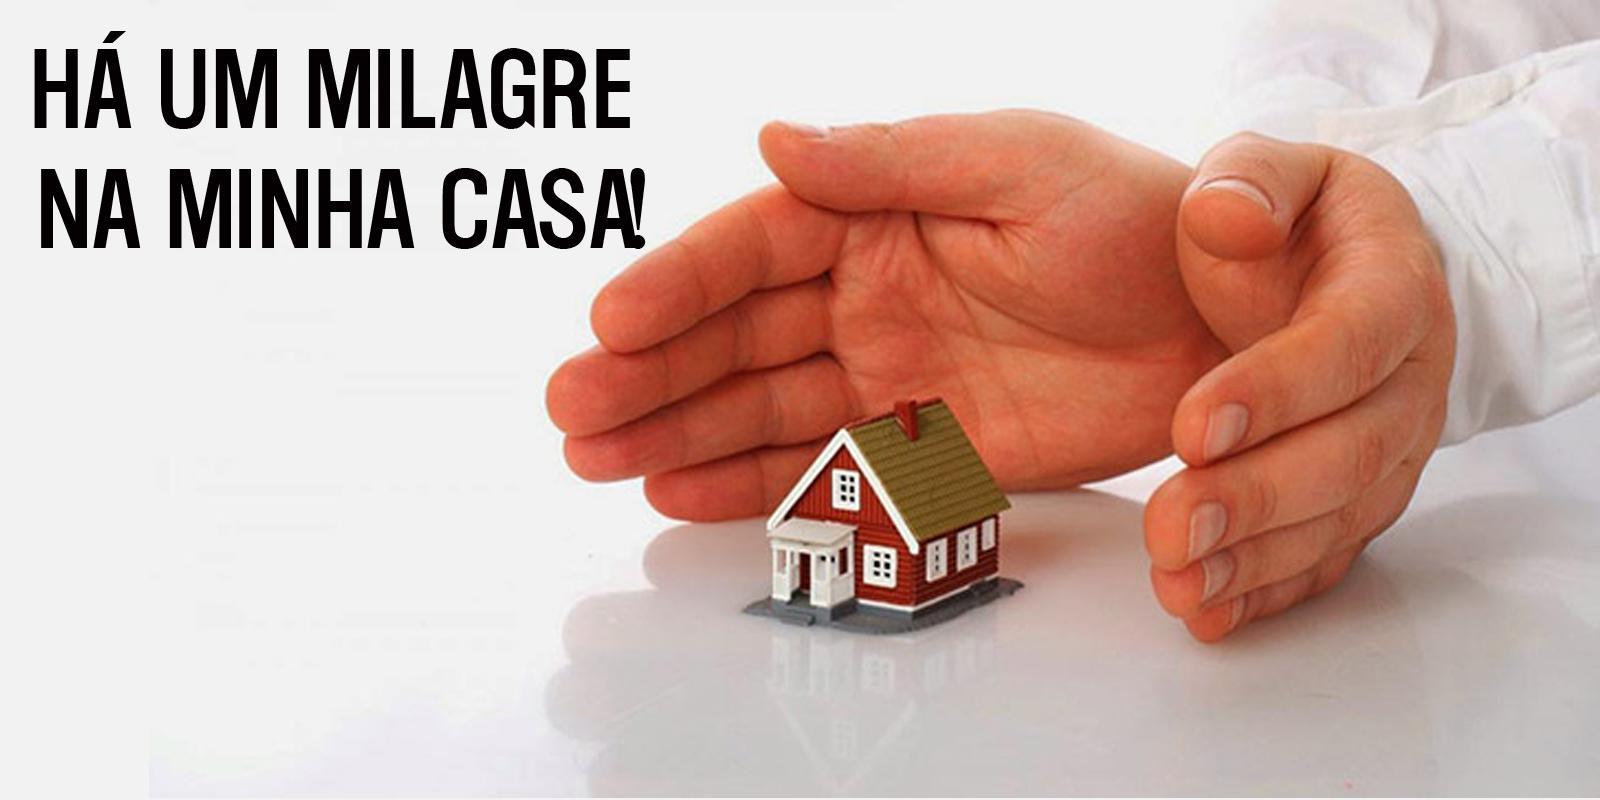 CULTO DE QUARTA-FEIRA